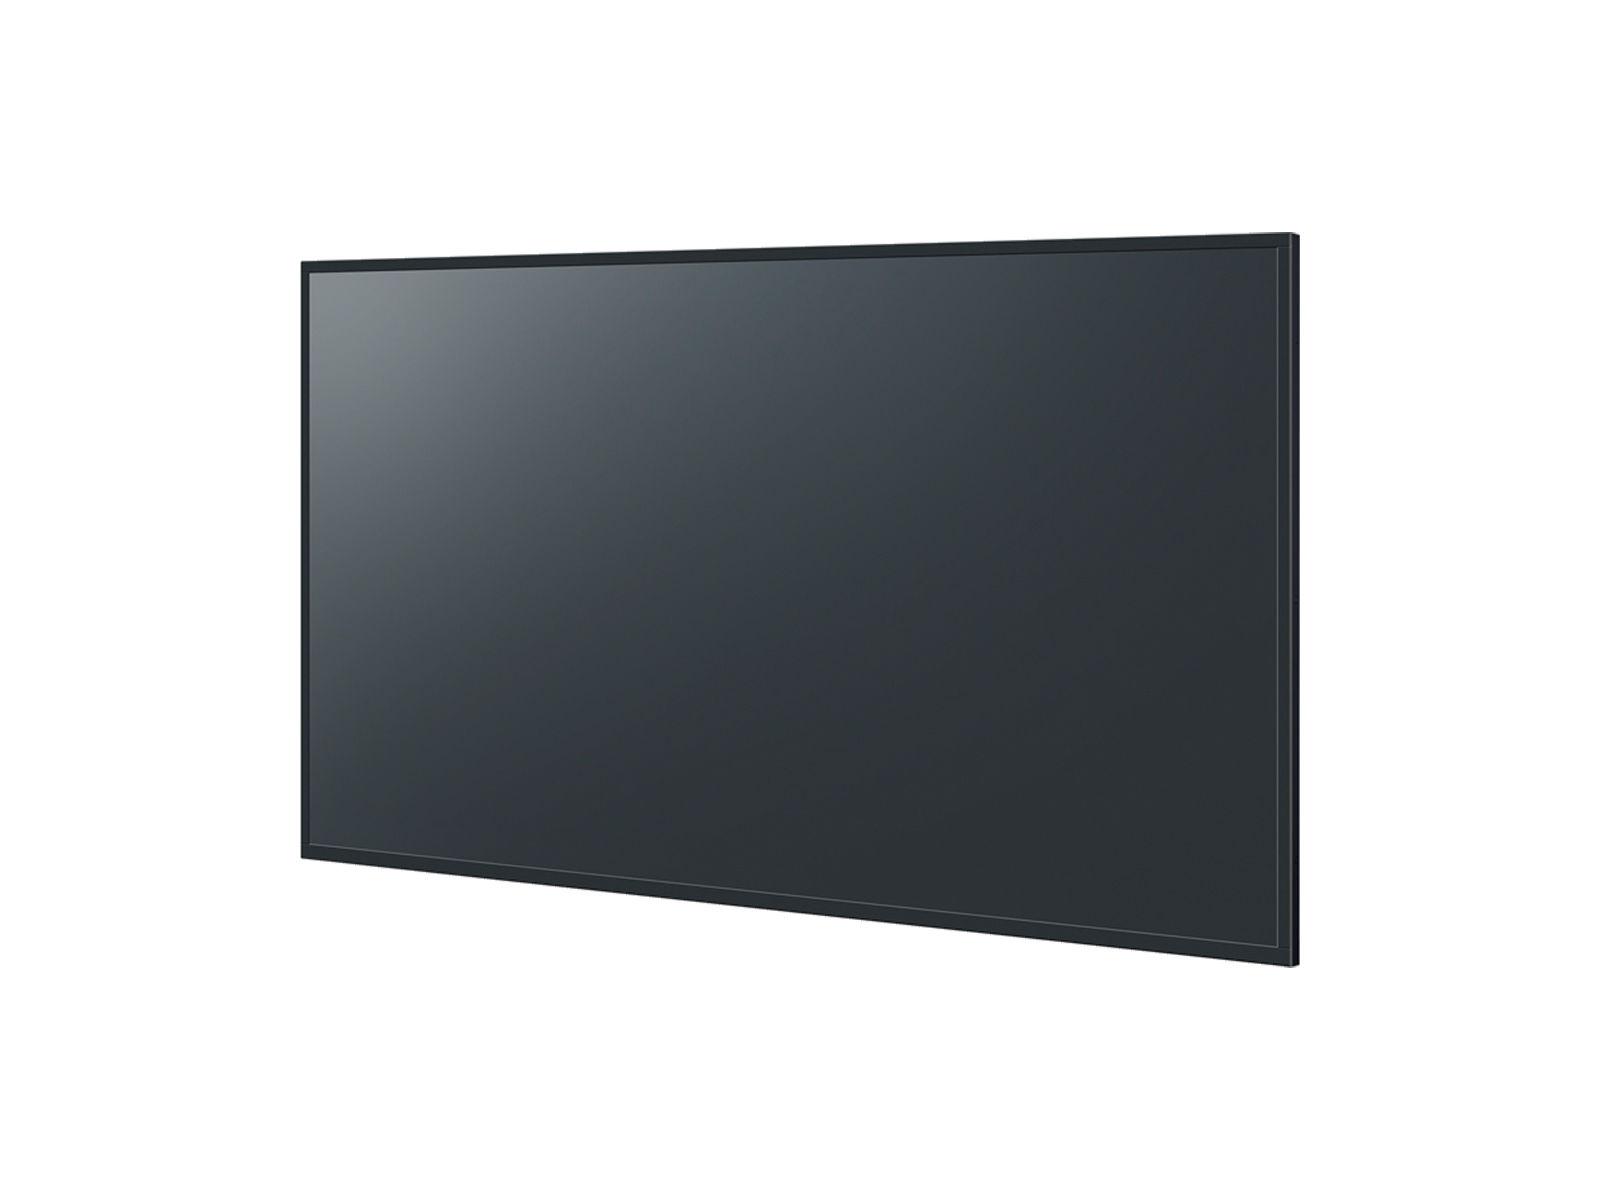 "Panasonic TH-55SQ1-IR | 55"" 139 cm, UHD LCD-Display, LED, 500 cd/m², DigitalLink (4k), Lautsprecher, USB Mediaplayer, schwa"